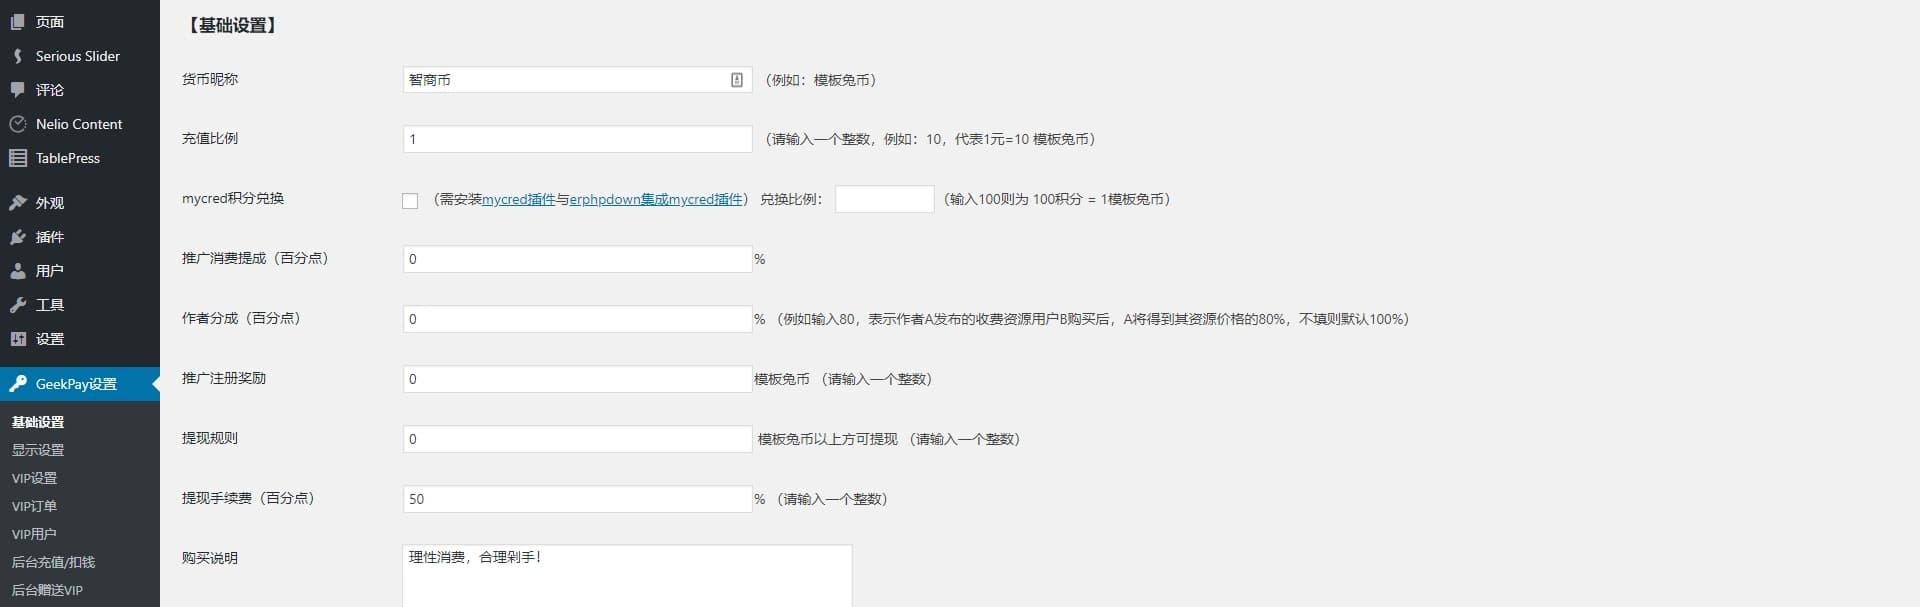 WordPress会员中心VIP收费下载插件集成支付宝/QQ/微信免签约充值(ErphpDown)